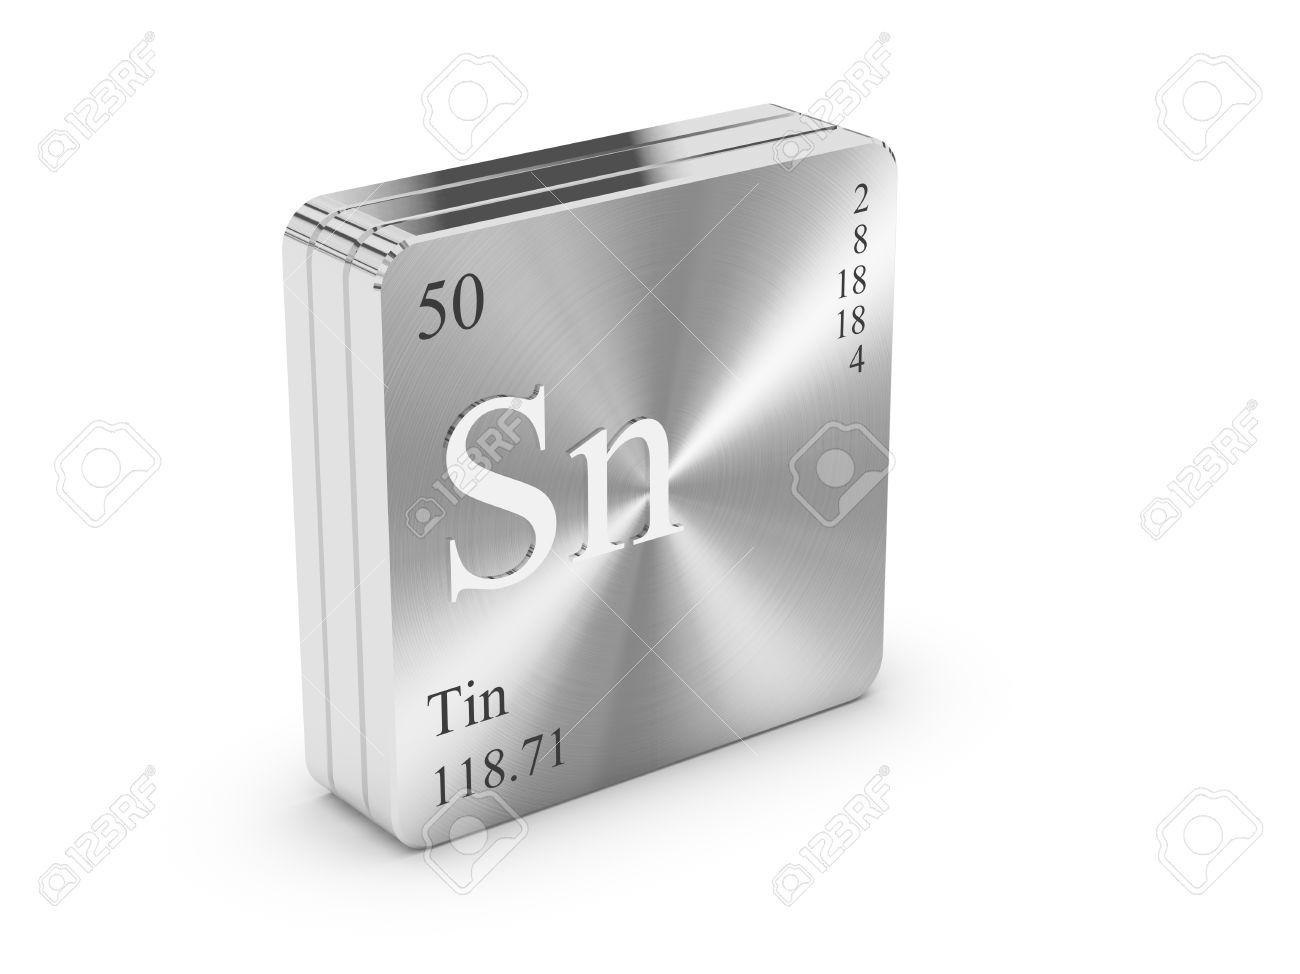 tin element on periodic table